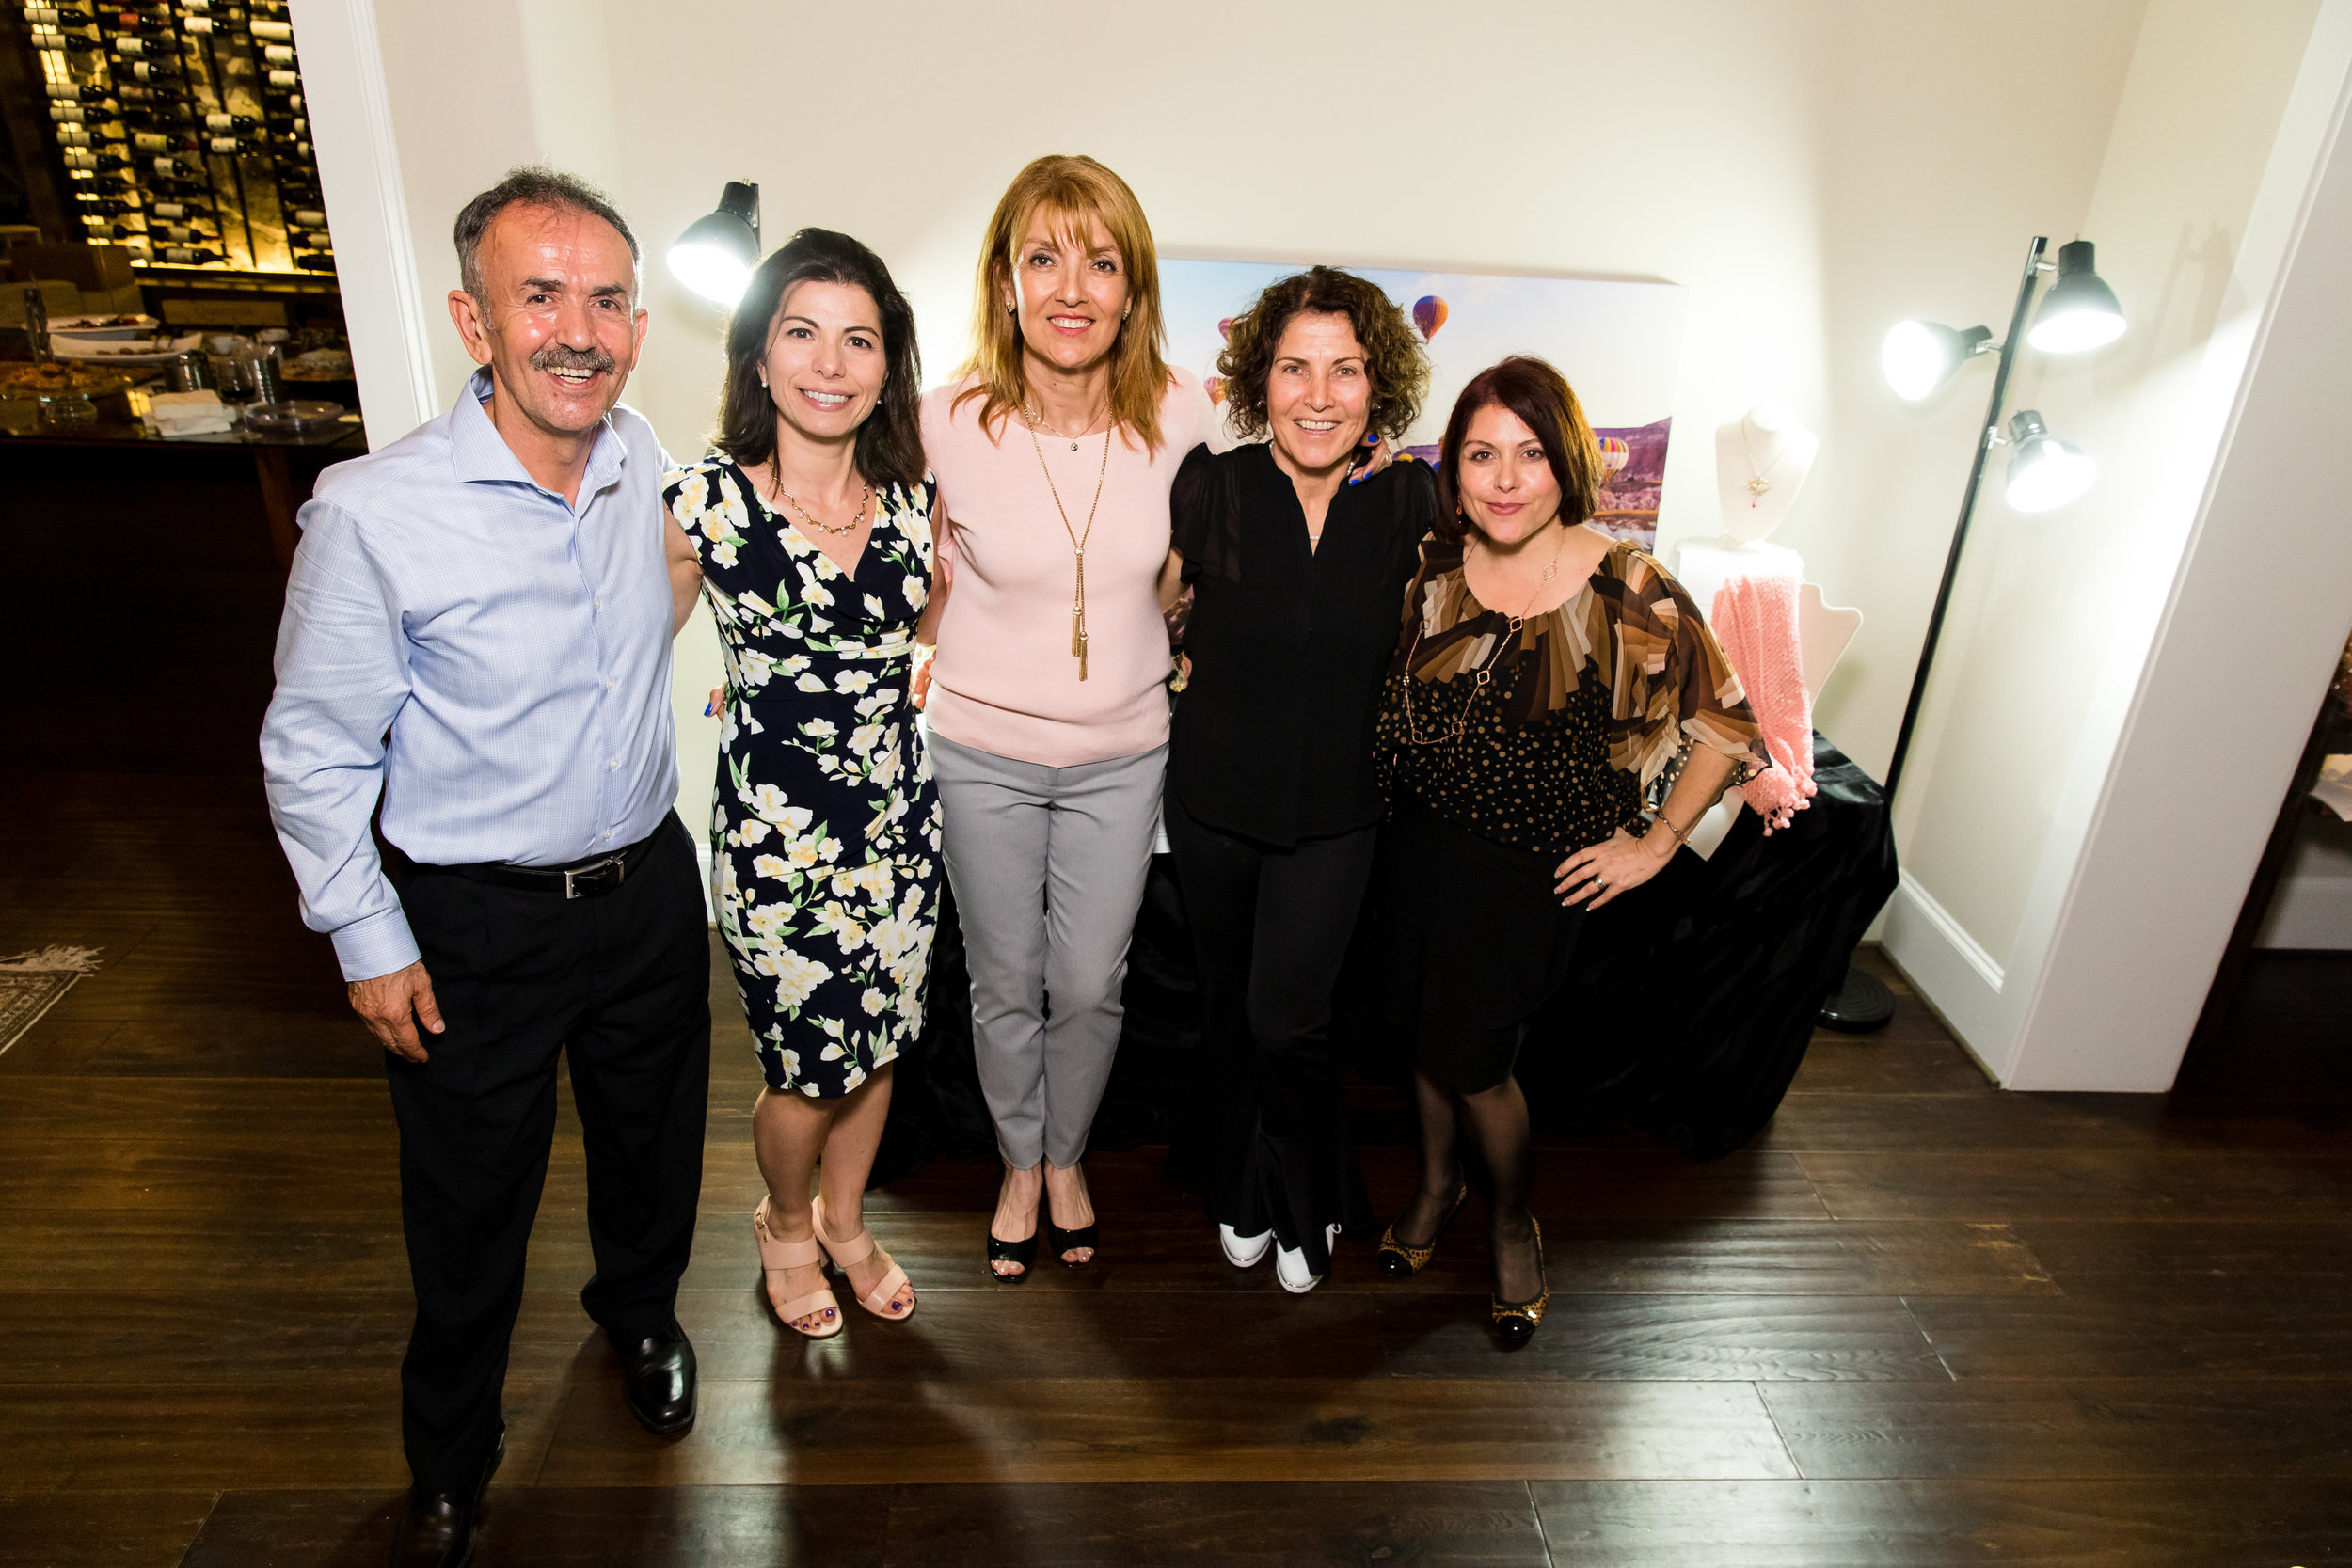 20180421-3rd Annual Education Women Turkey-407.jpg